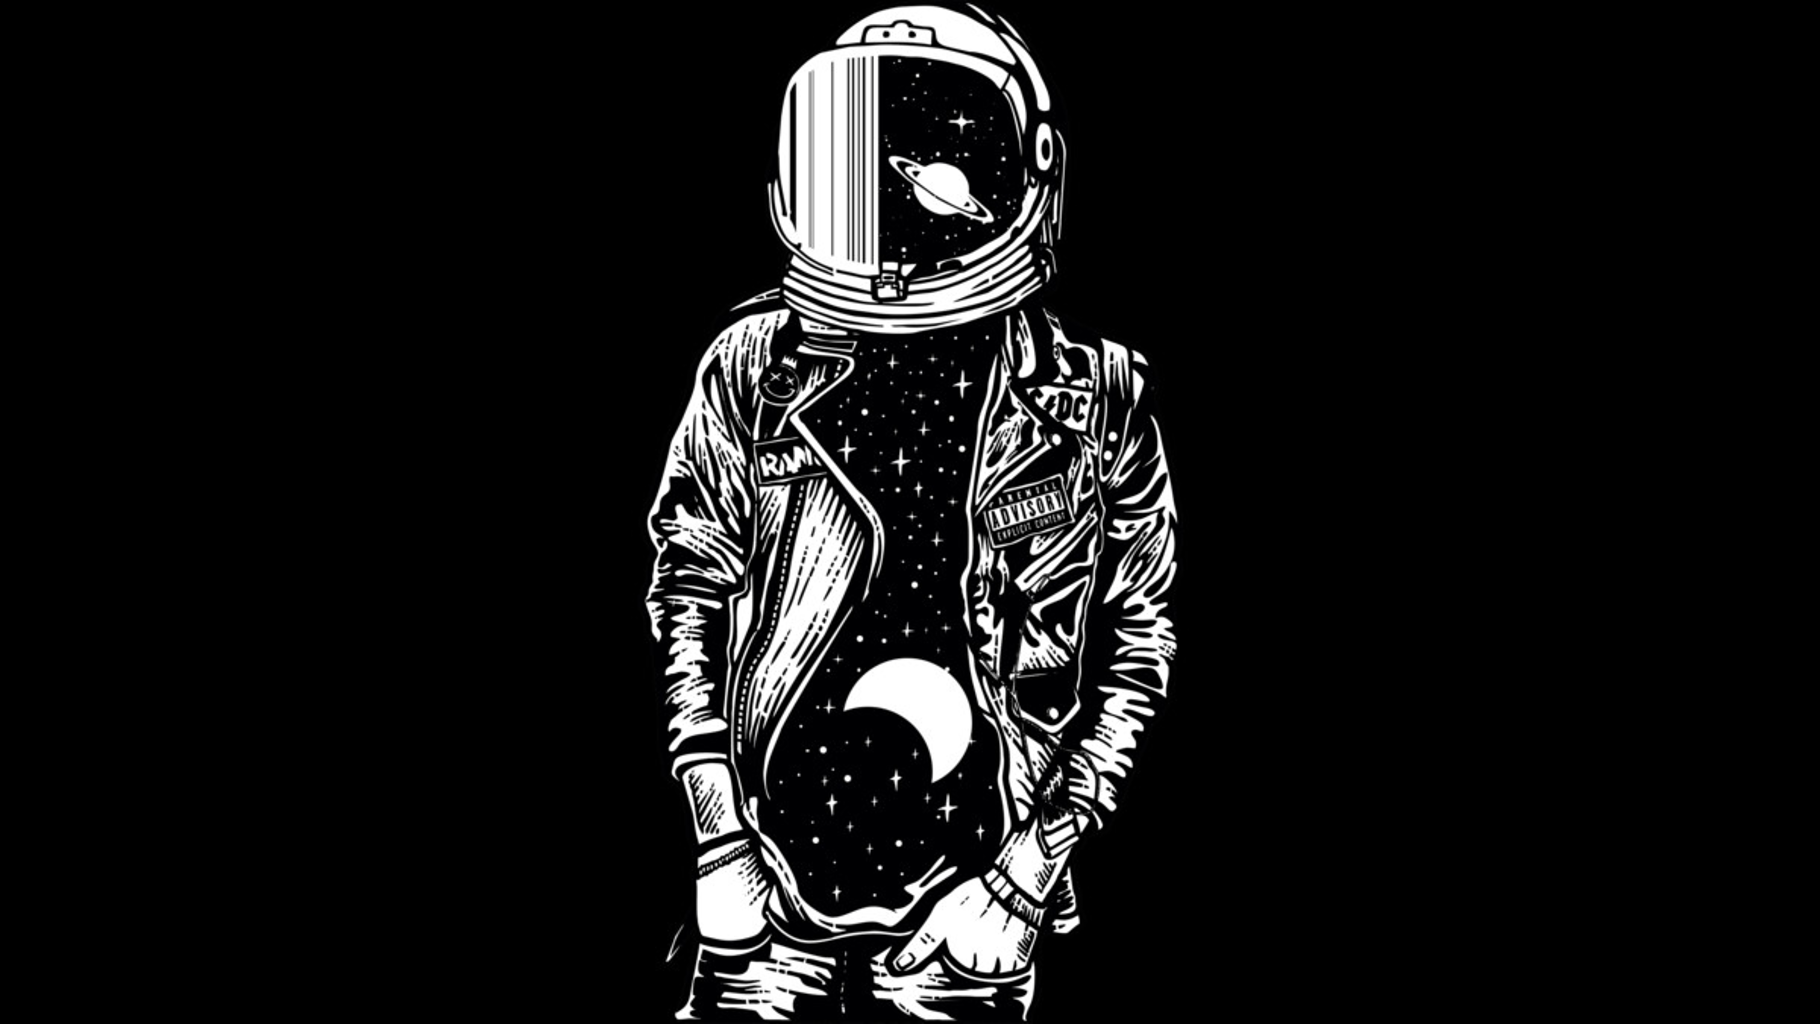 Design by Humans: Astropunk